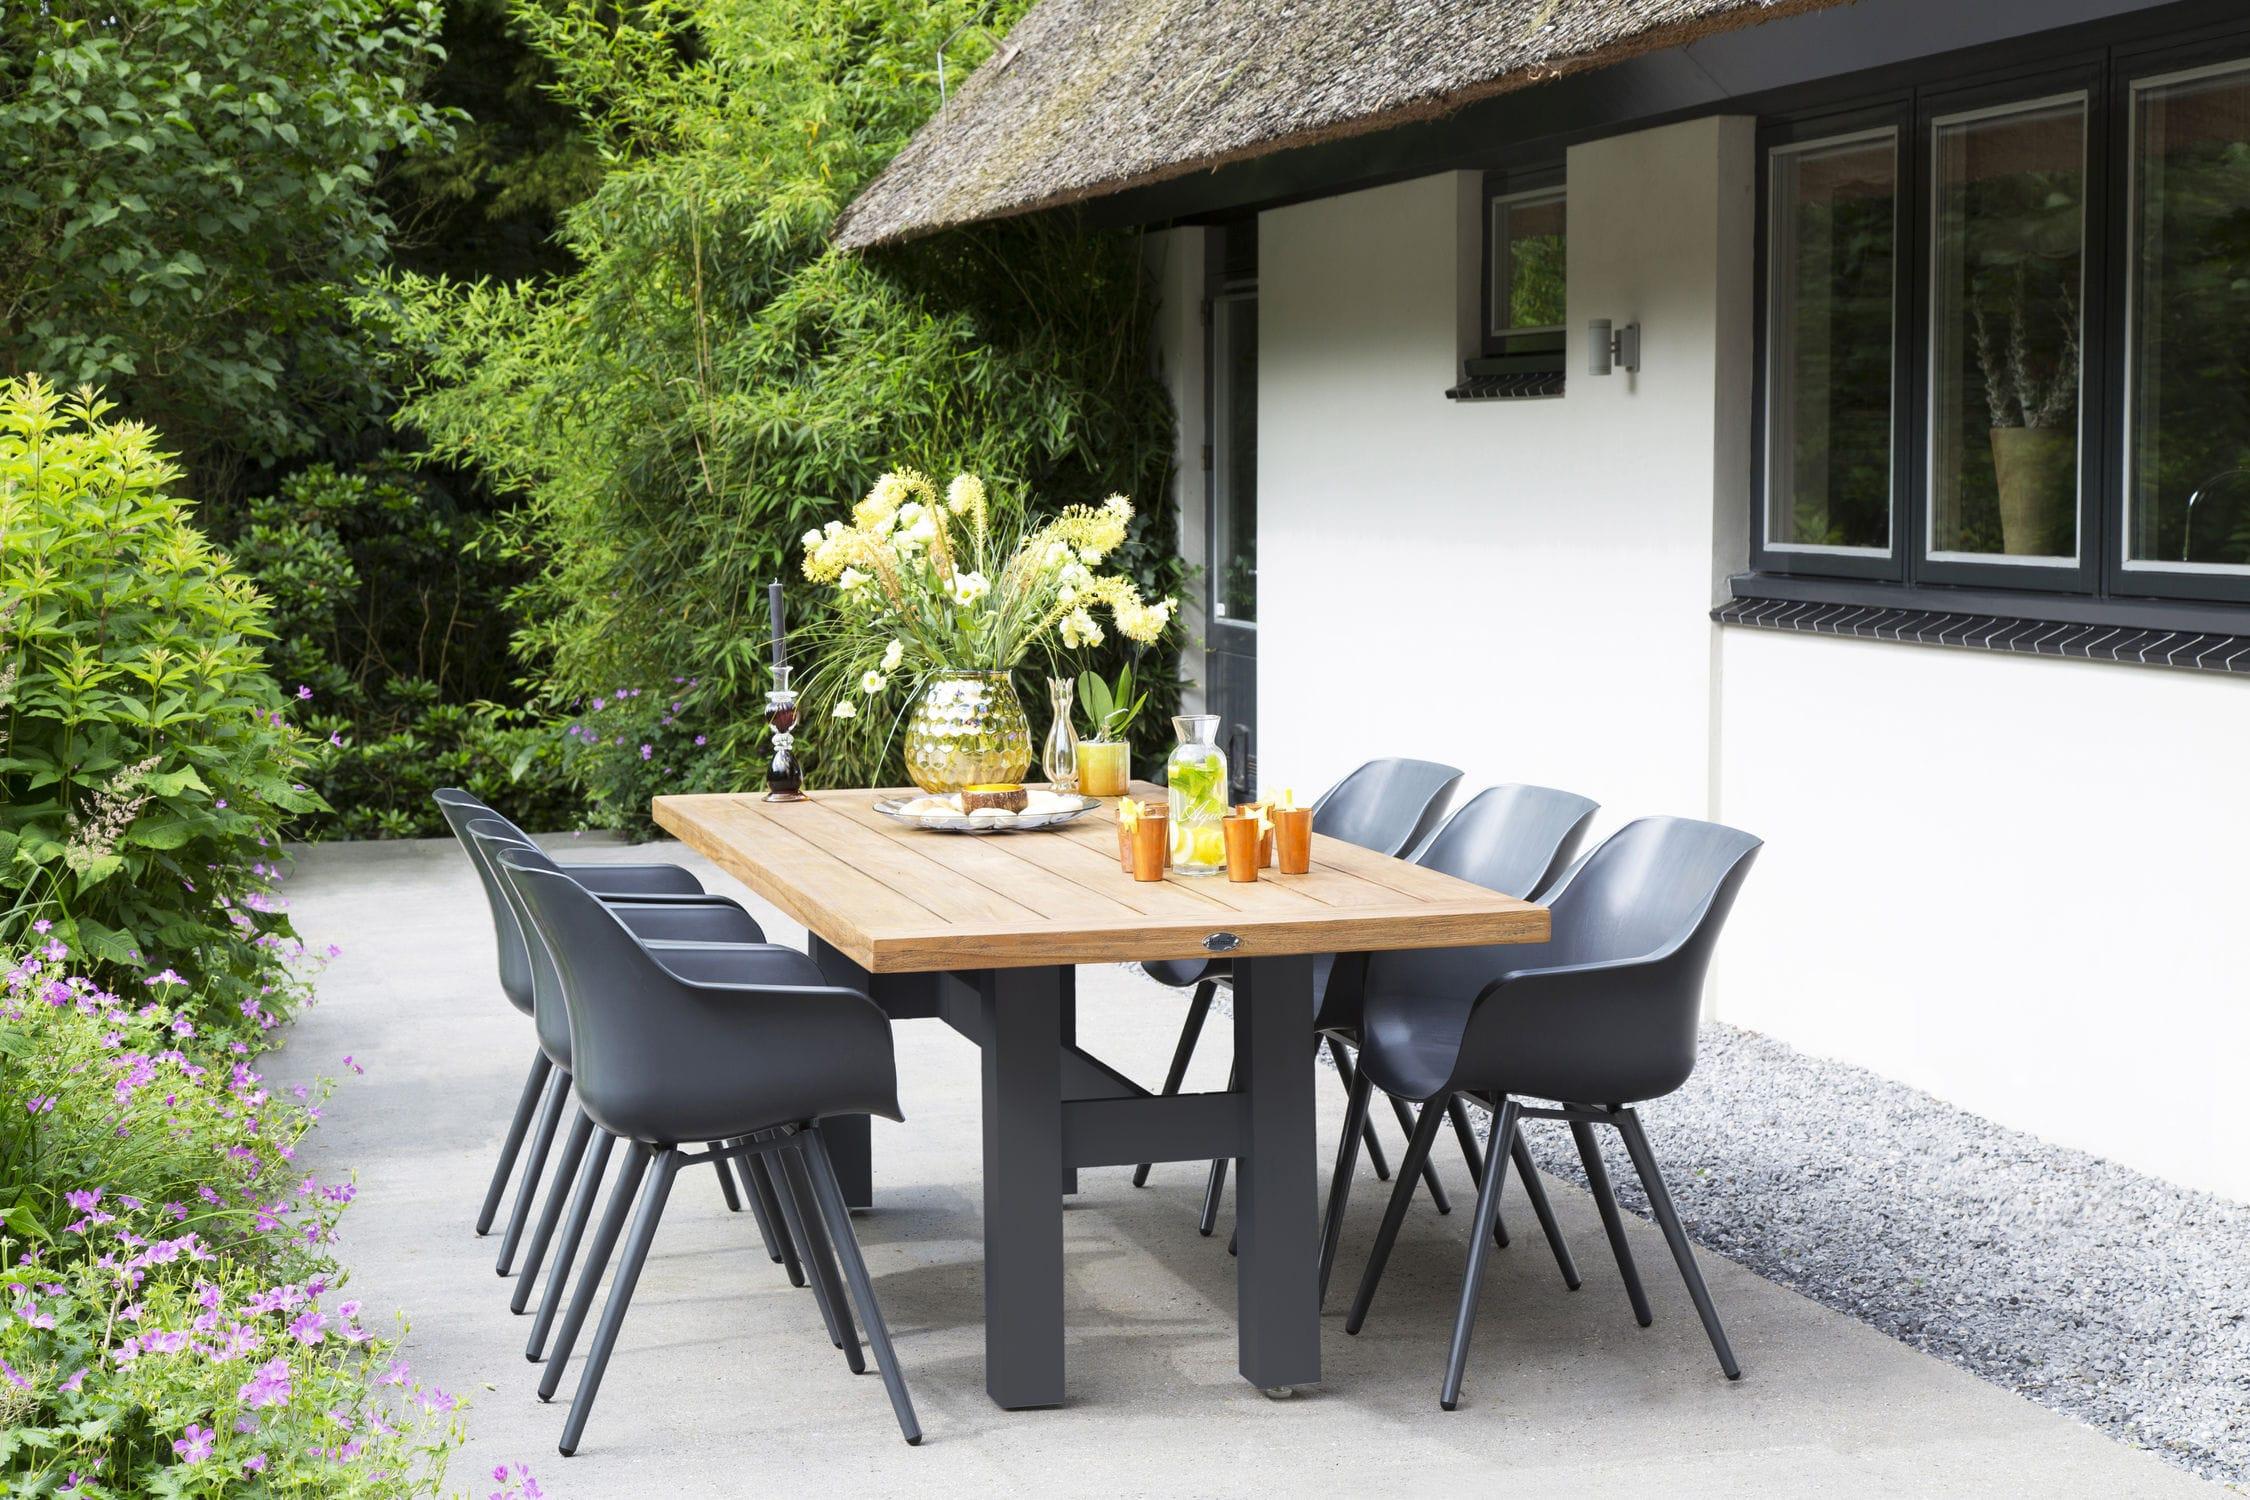 Conjunto de mesa y silla moderno de aluminio de resina de